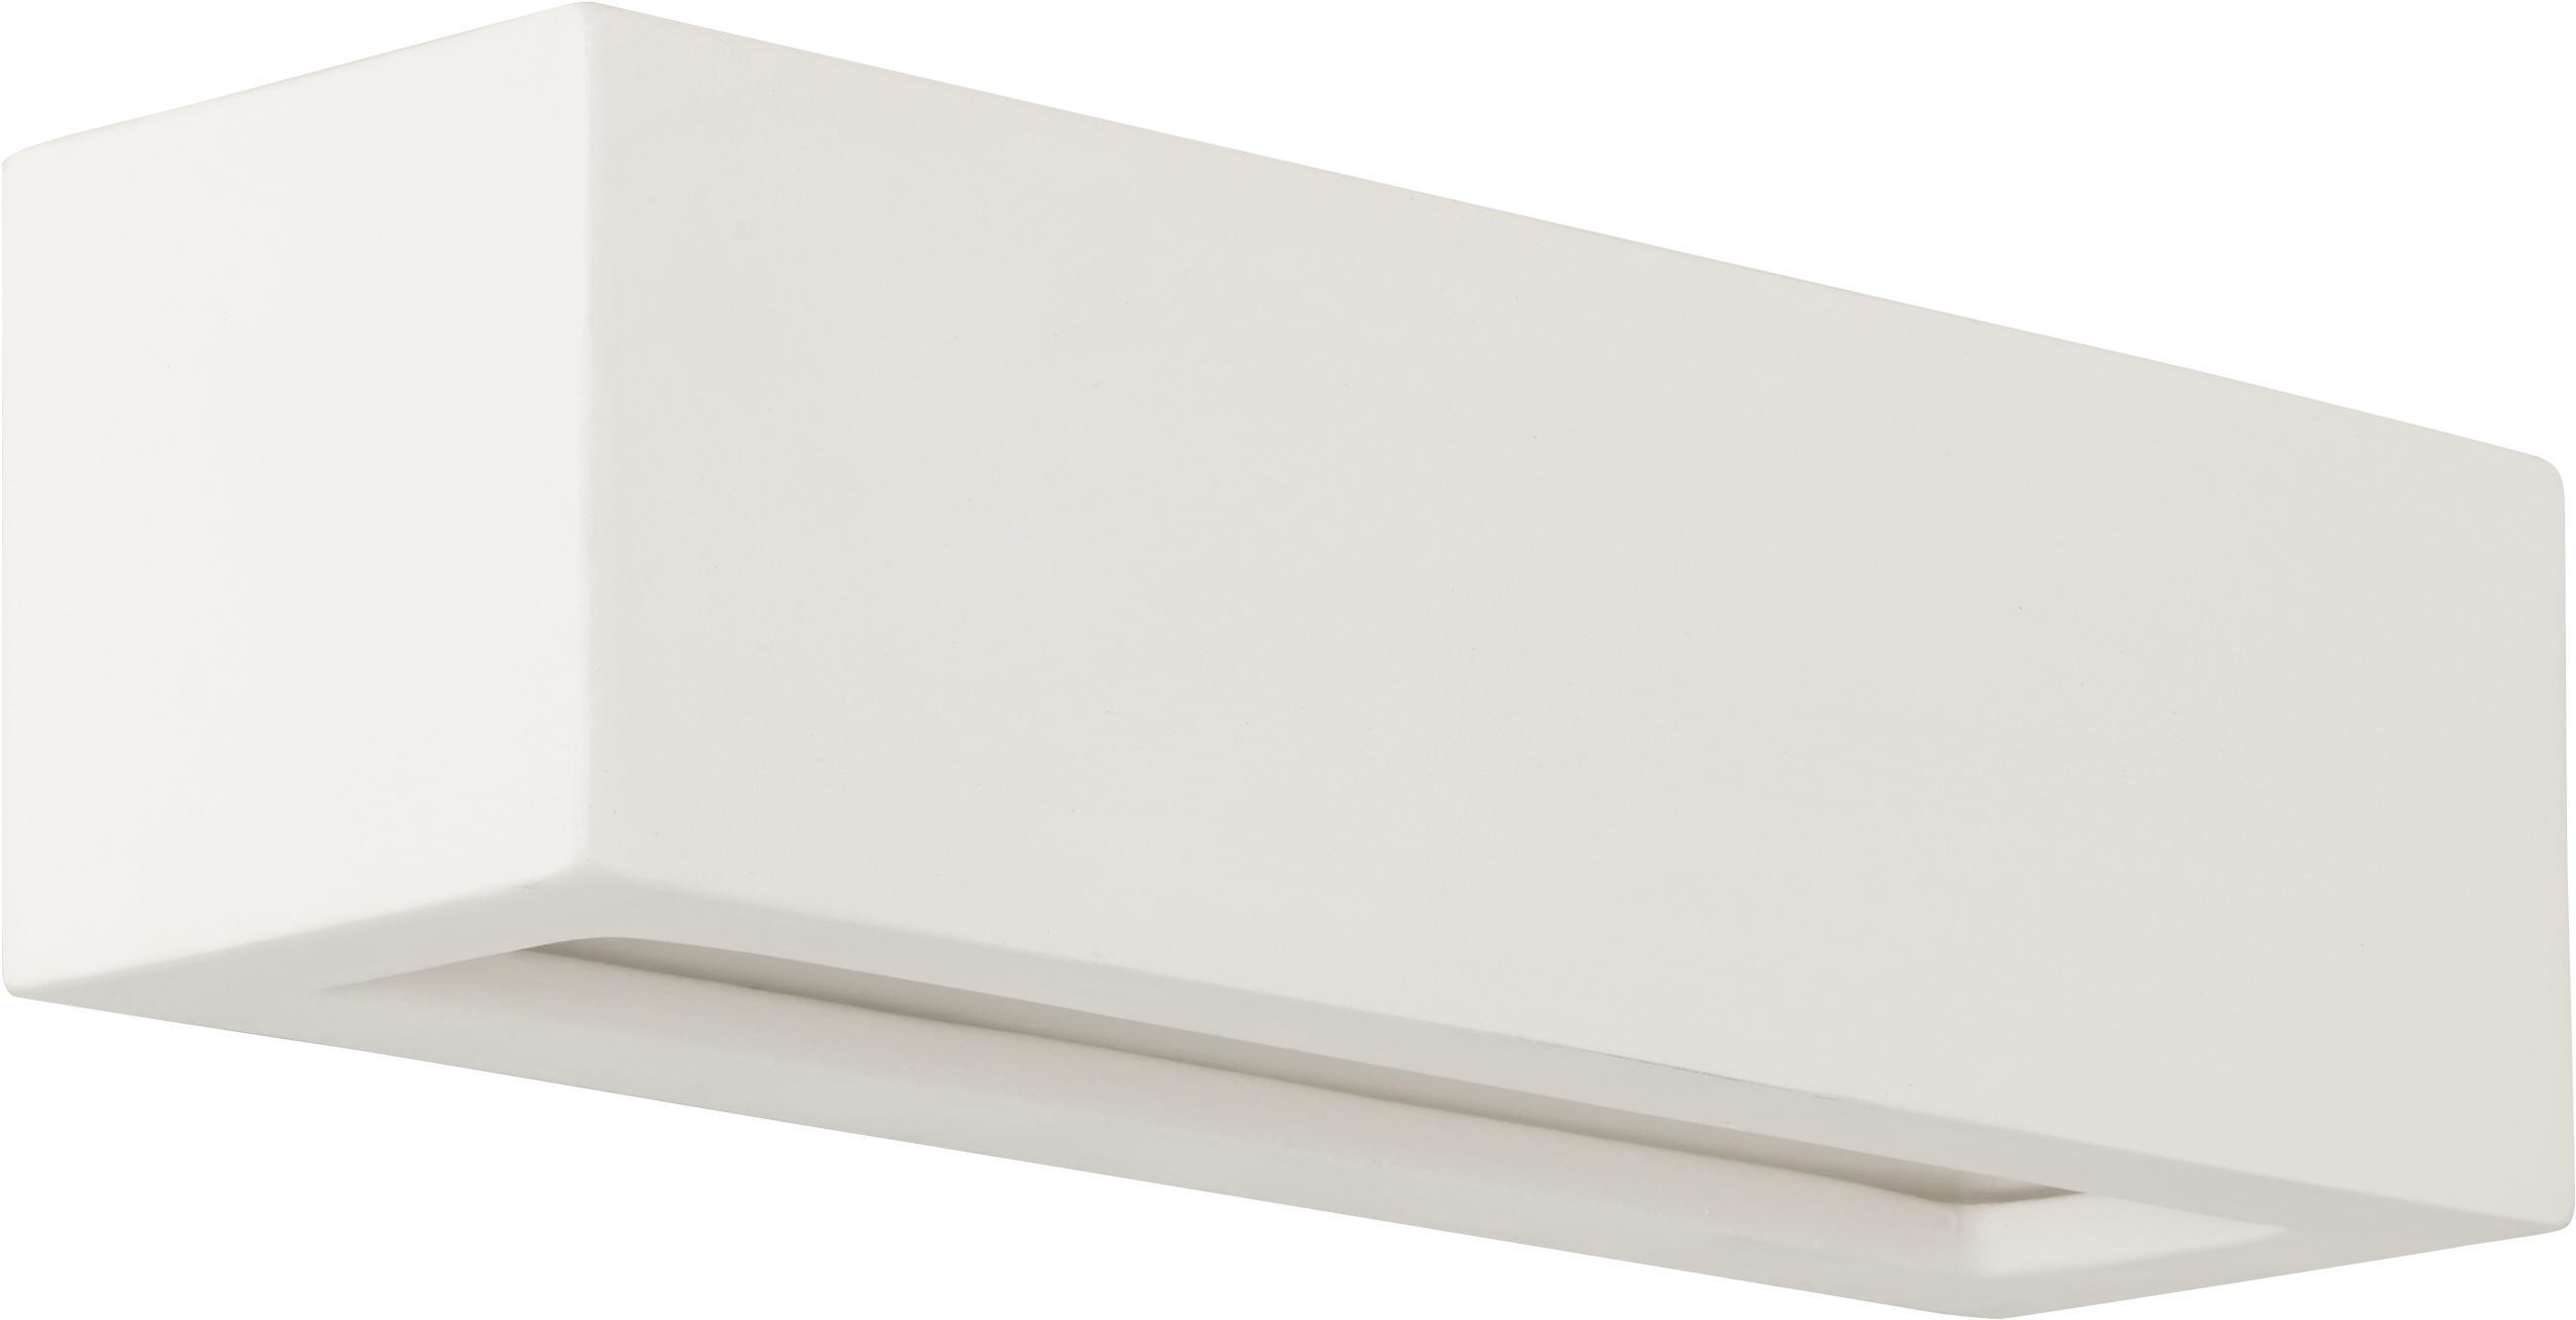 Aplique de cerámica Madrid, Blanco, An 32 x Al 9 cm